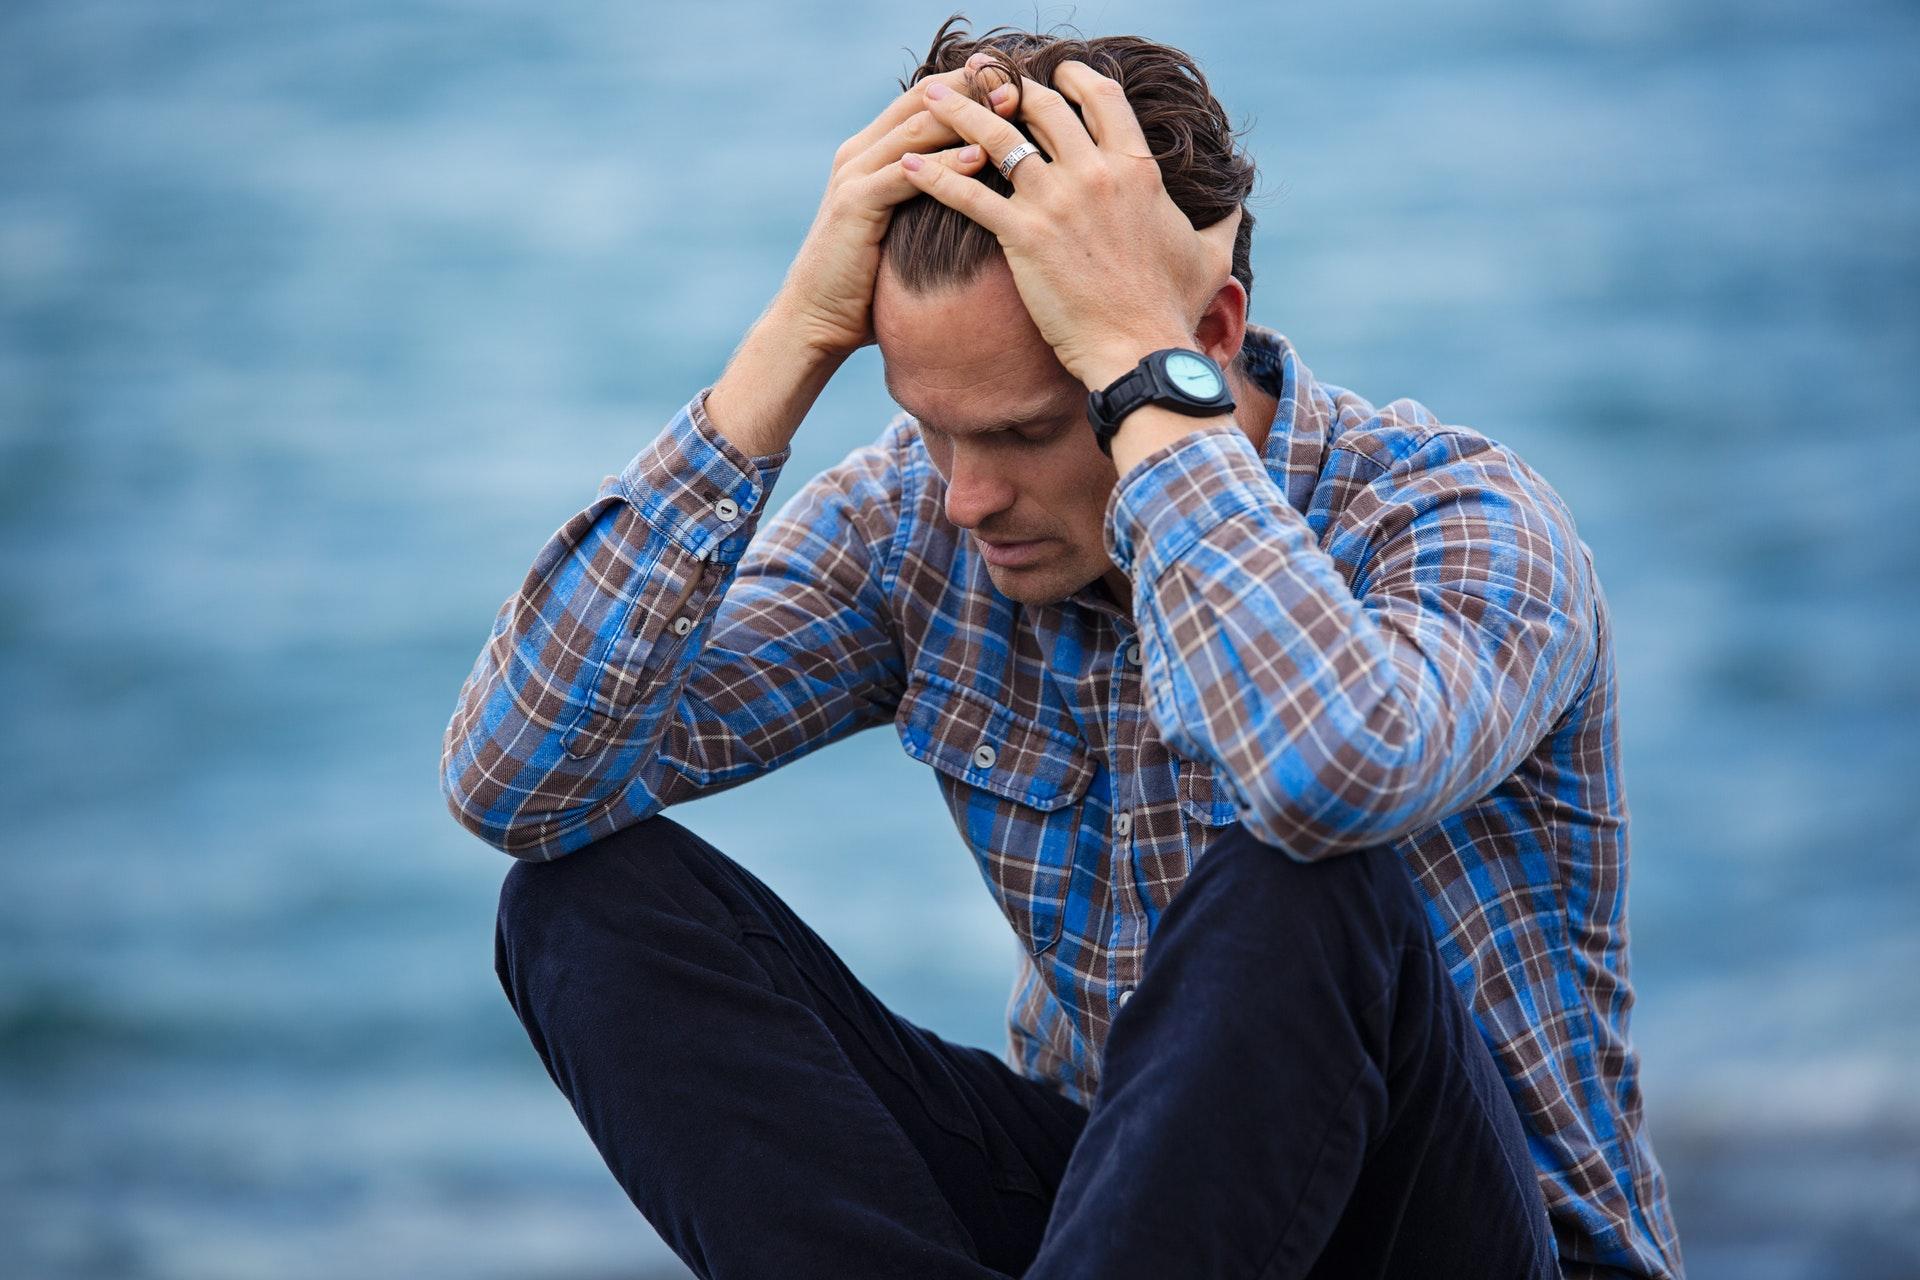 https://www.quandarypond.com/wp-content/uploads/2019/10/anxiety-anxioud-man-sitting.jpg